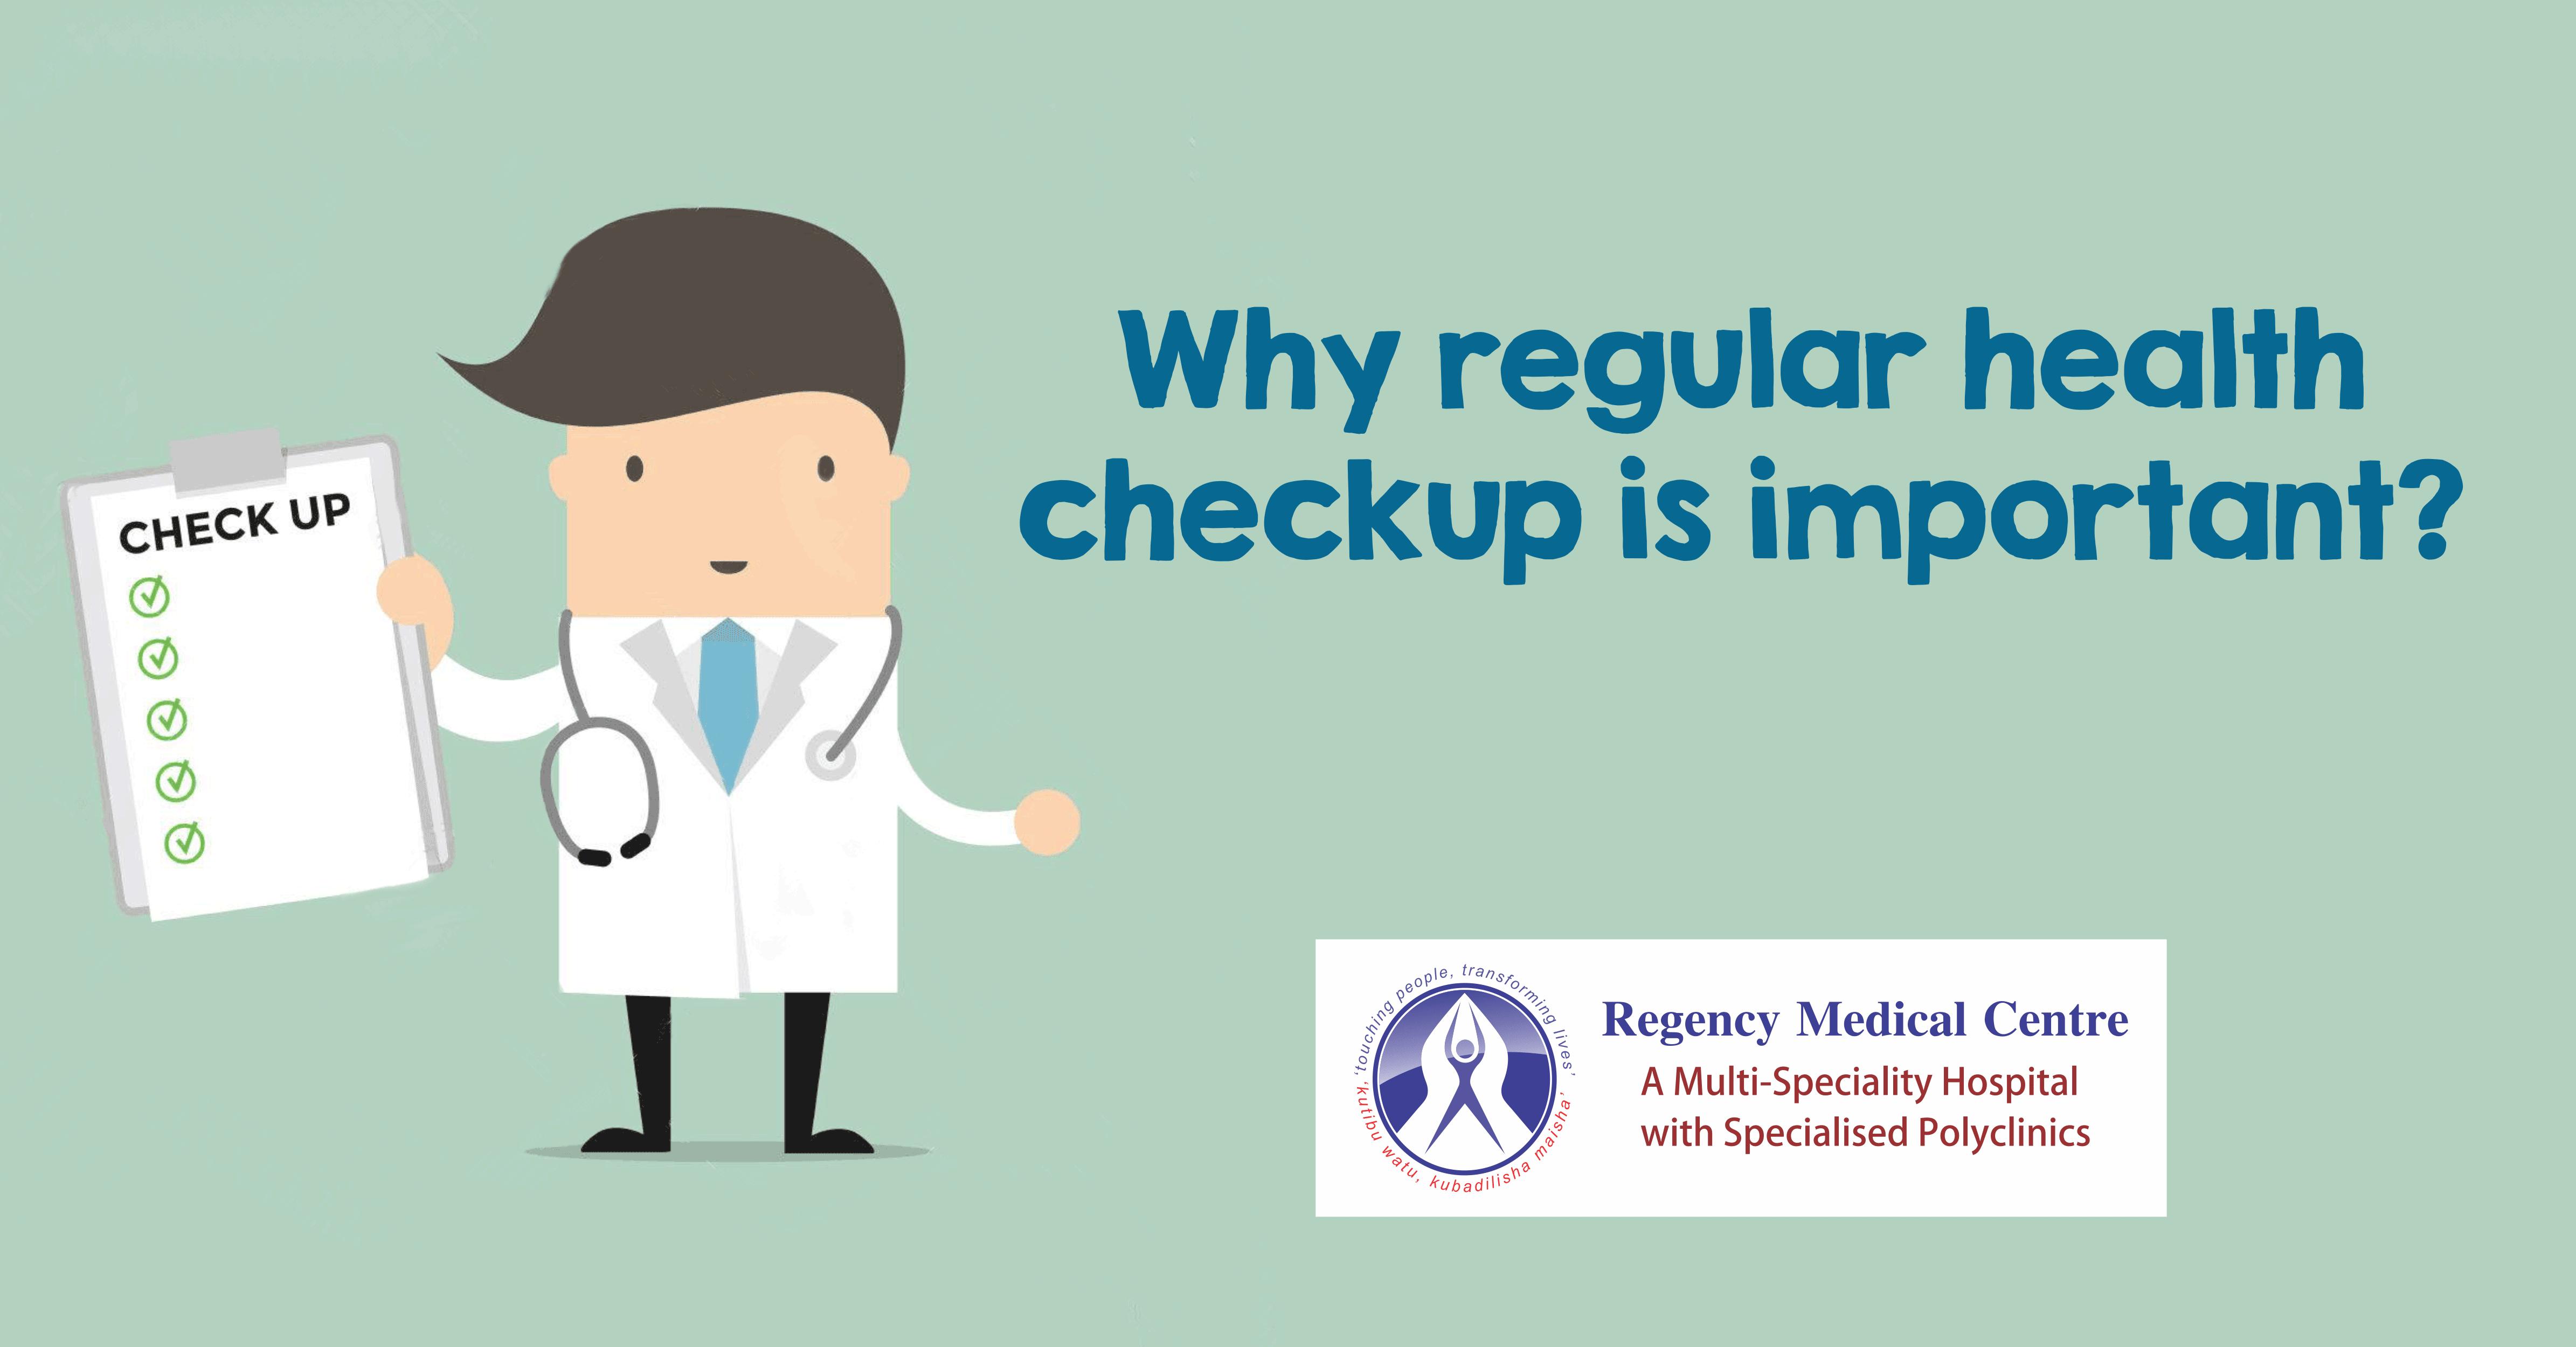 Regular health checkups at regency medical centre